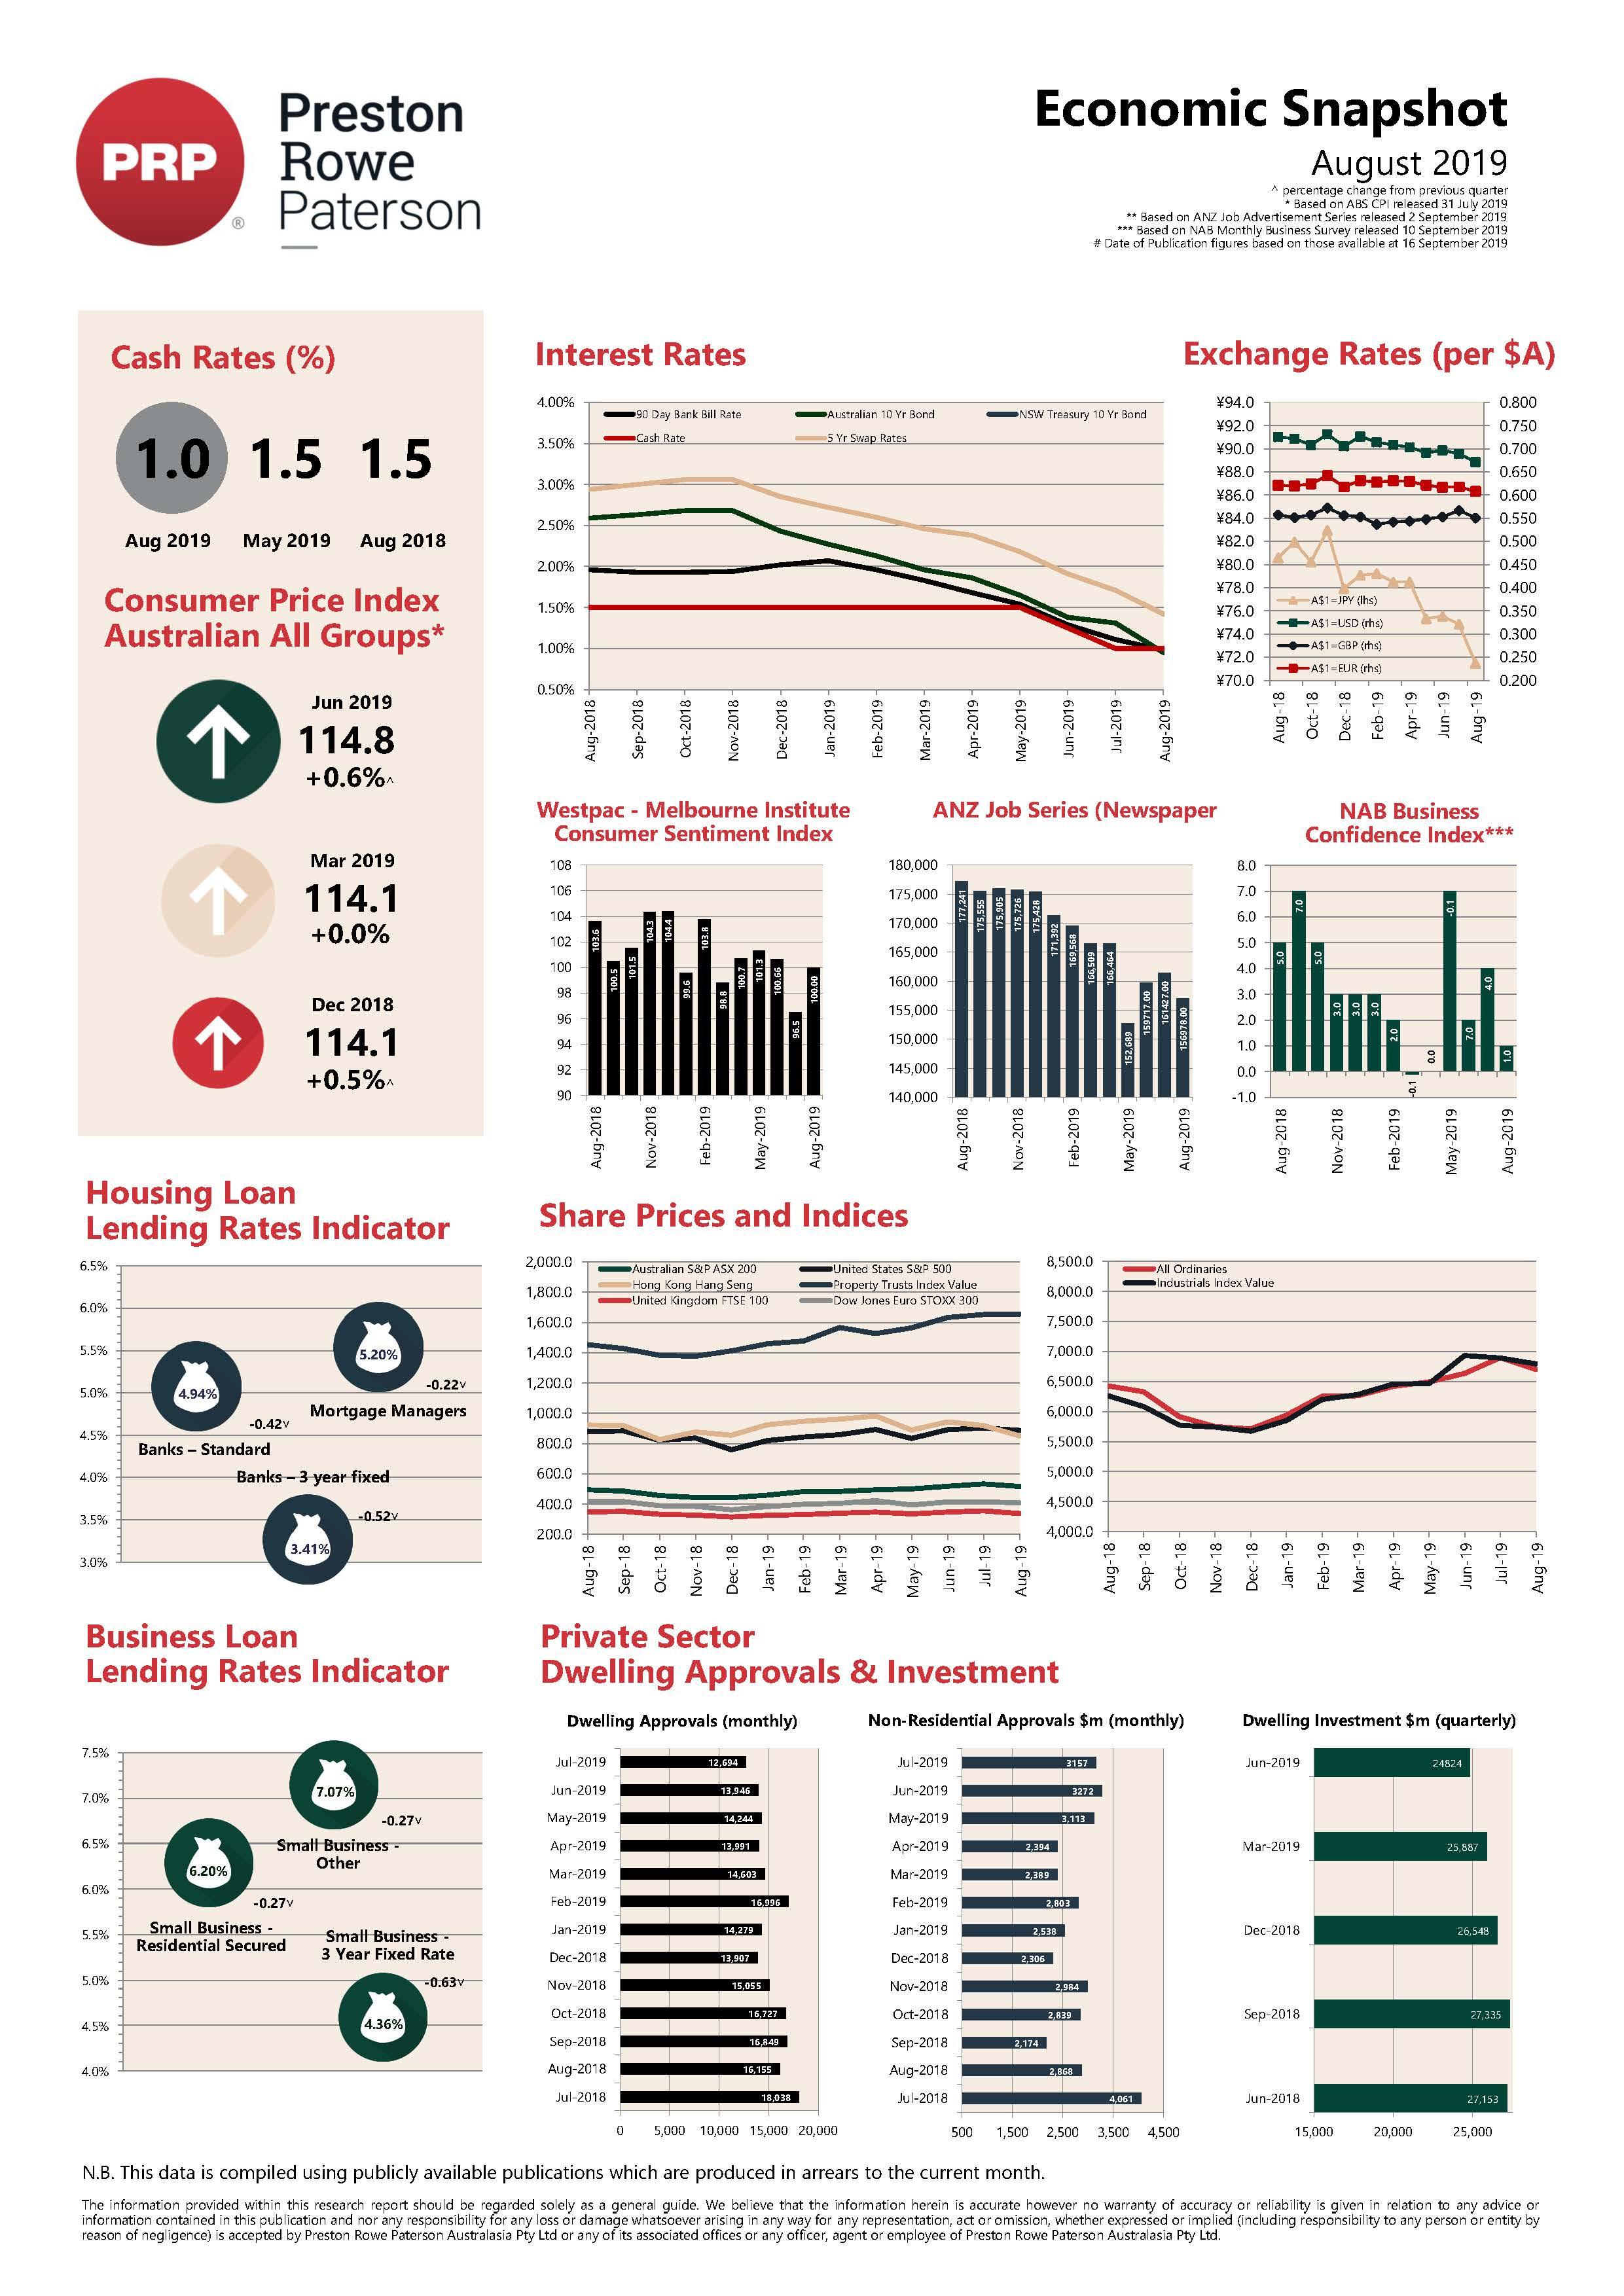 Economic Snapshot August 2019